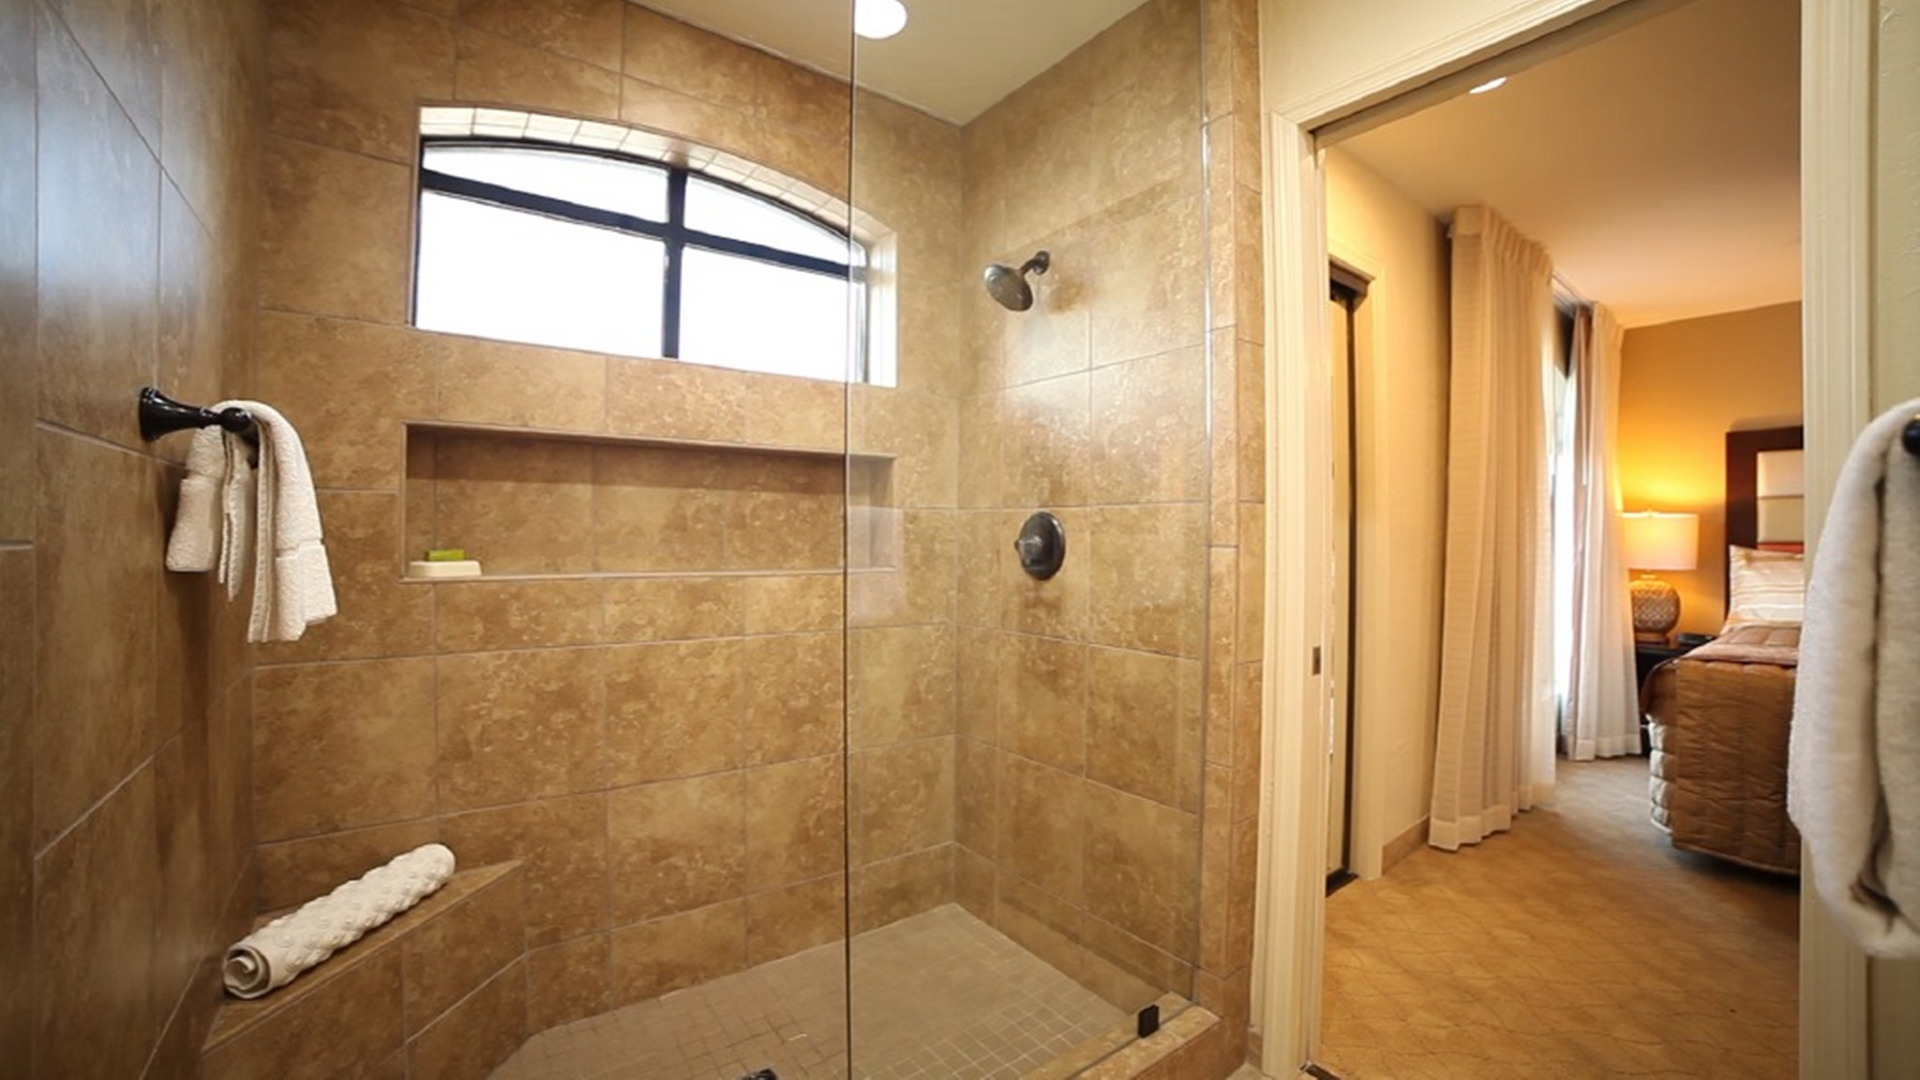 Barcelona Bathroom - Copy.png